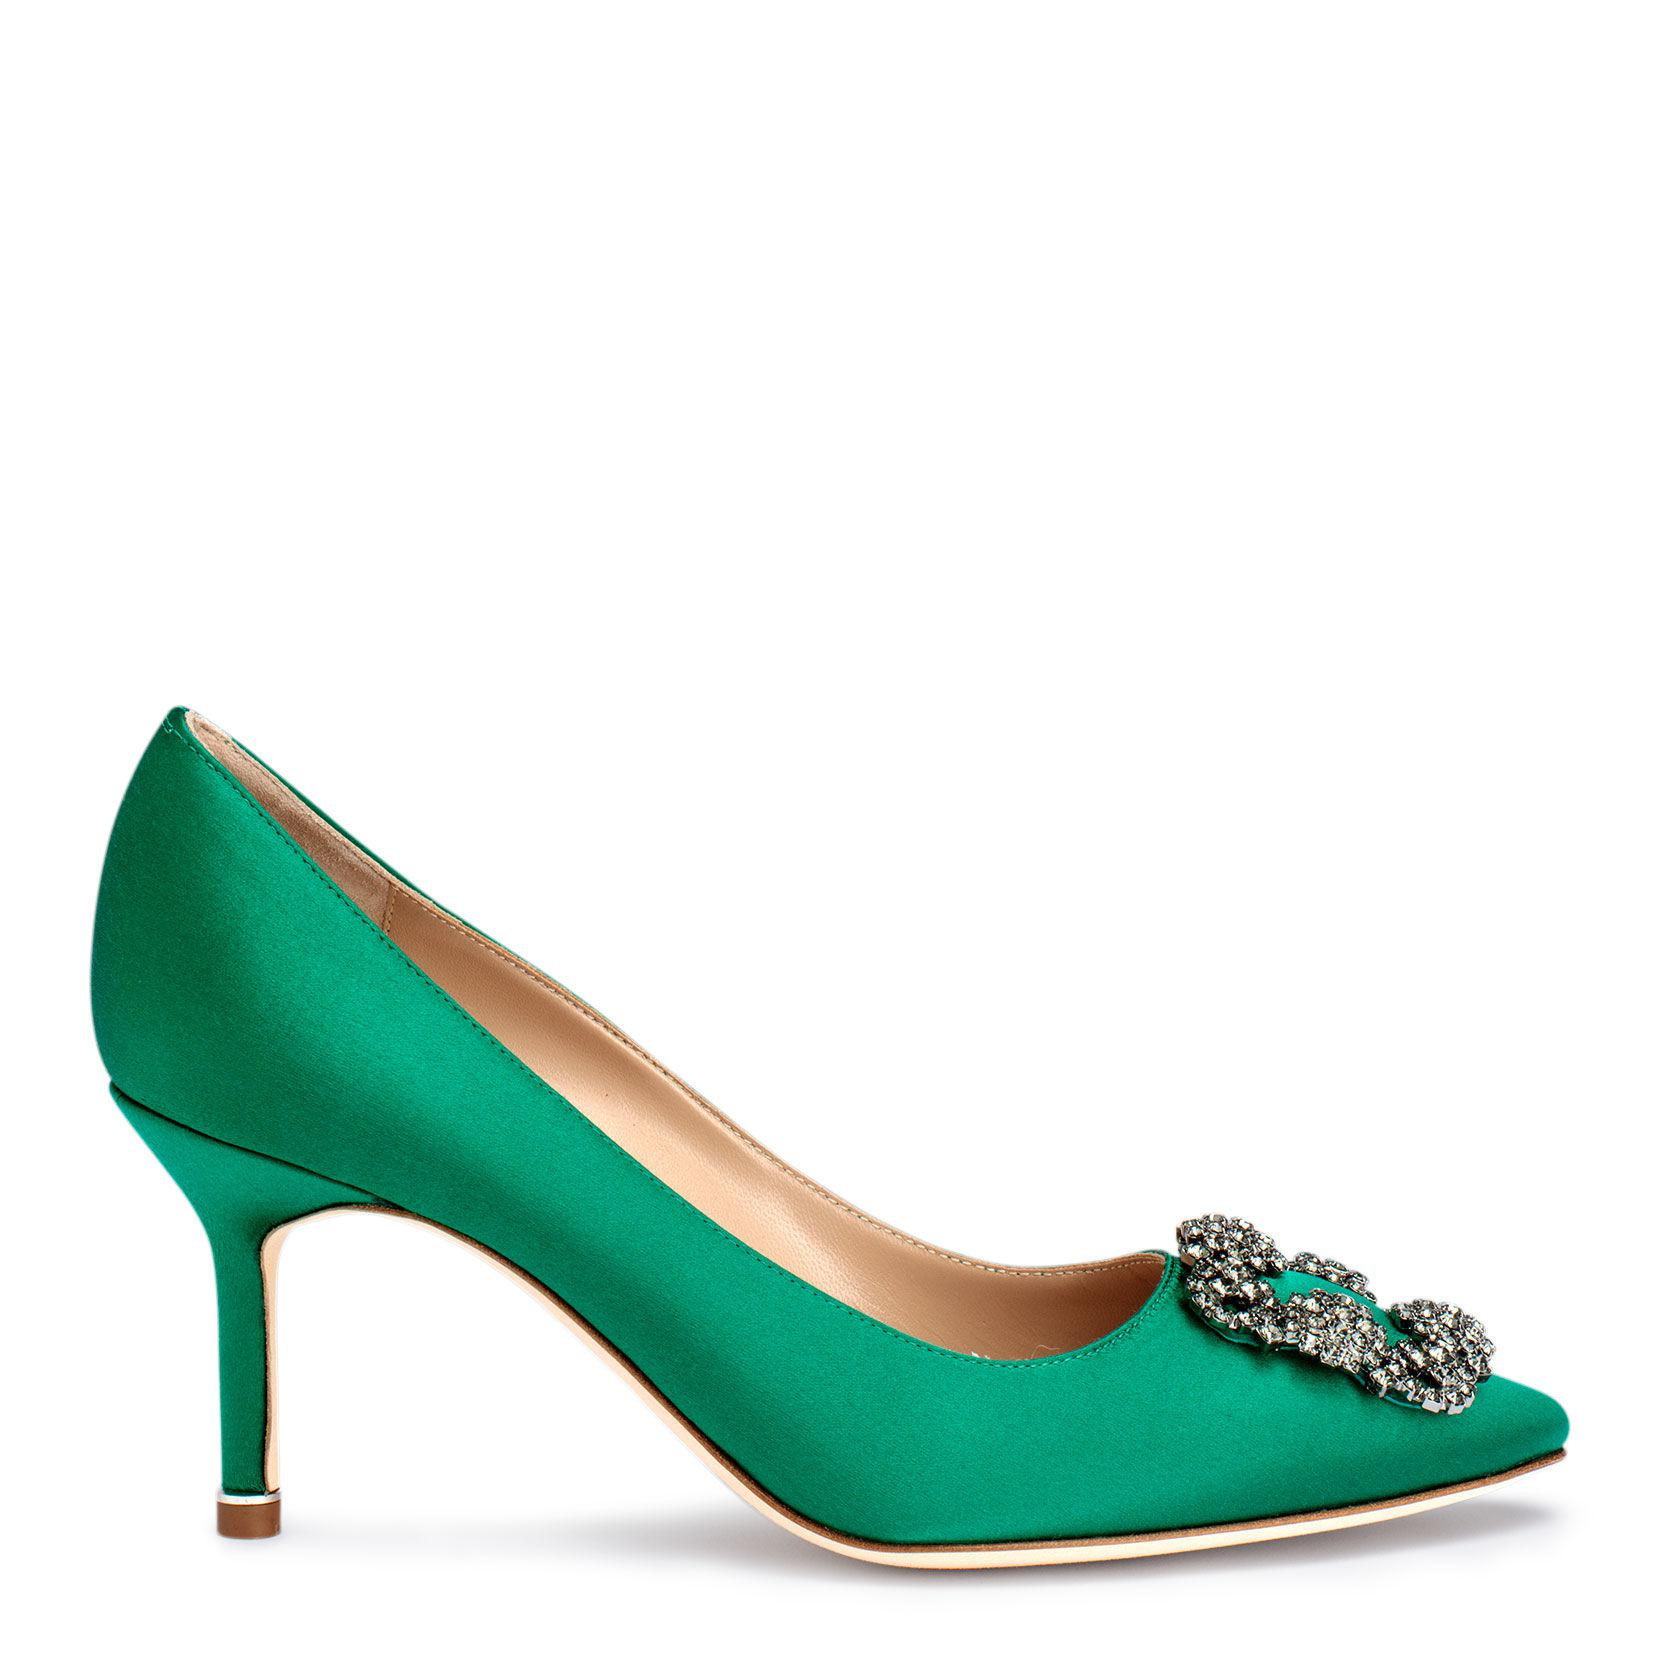 494cbb5c02f Manolo Blahnik - Green Hangisi 70 Emerald Satin Pumps - Lyst. View  fullscreen